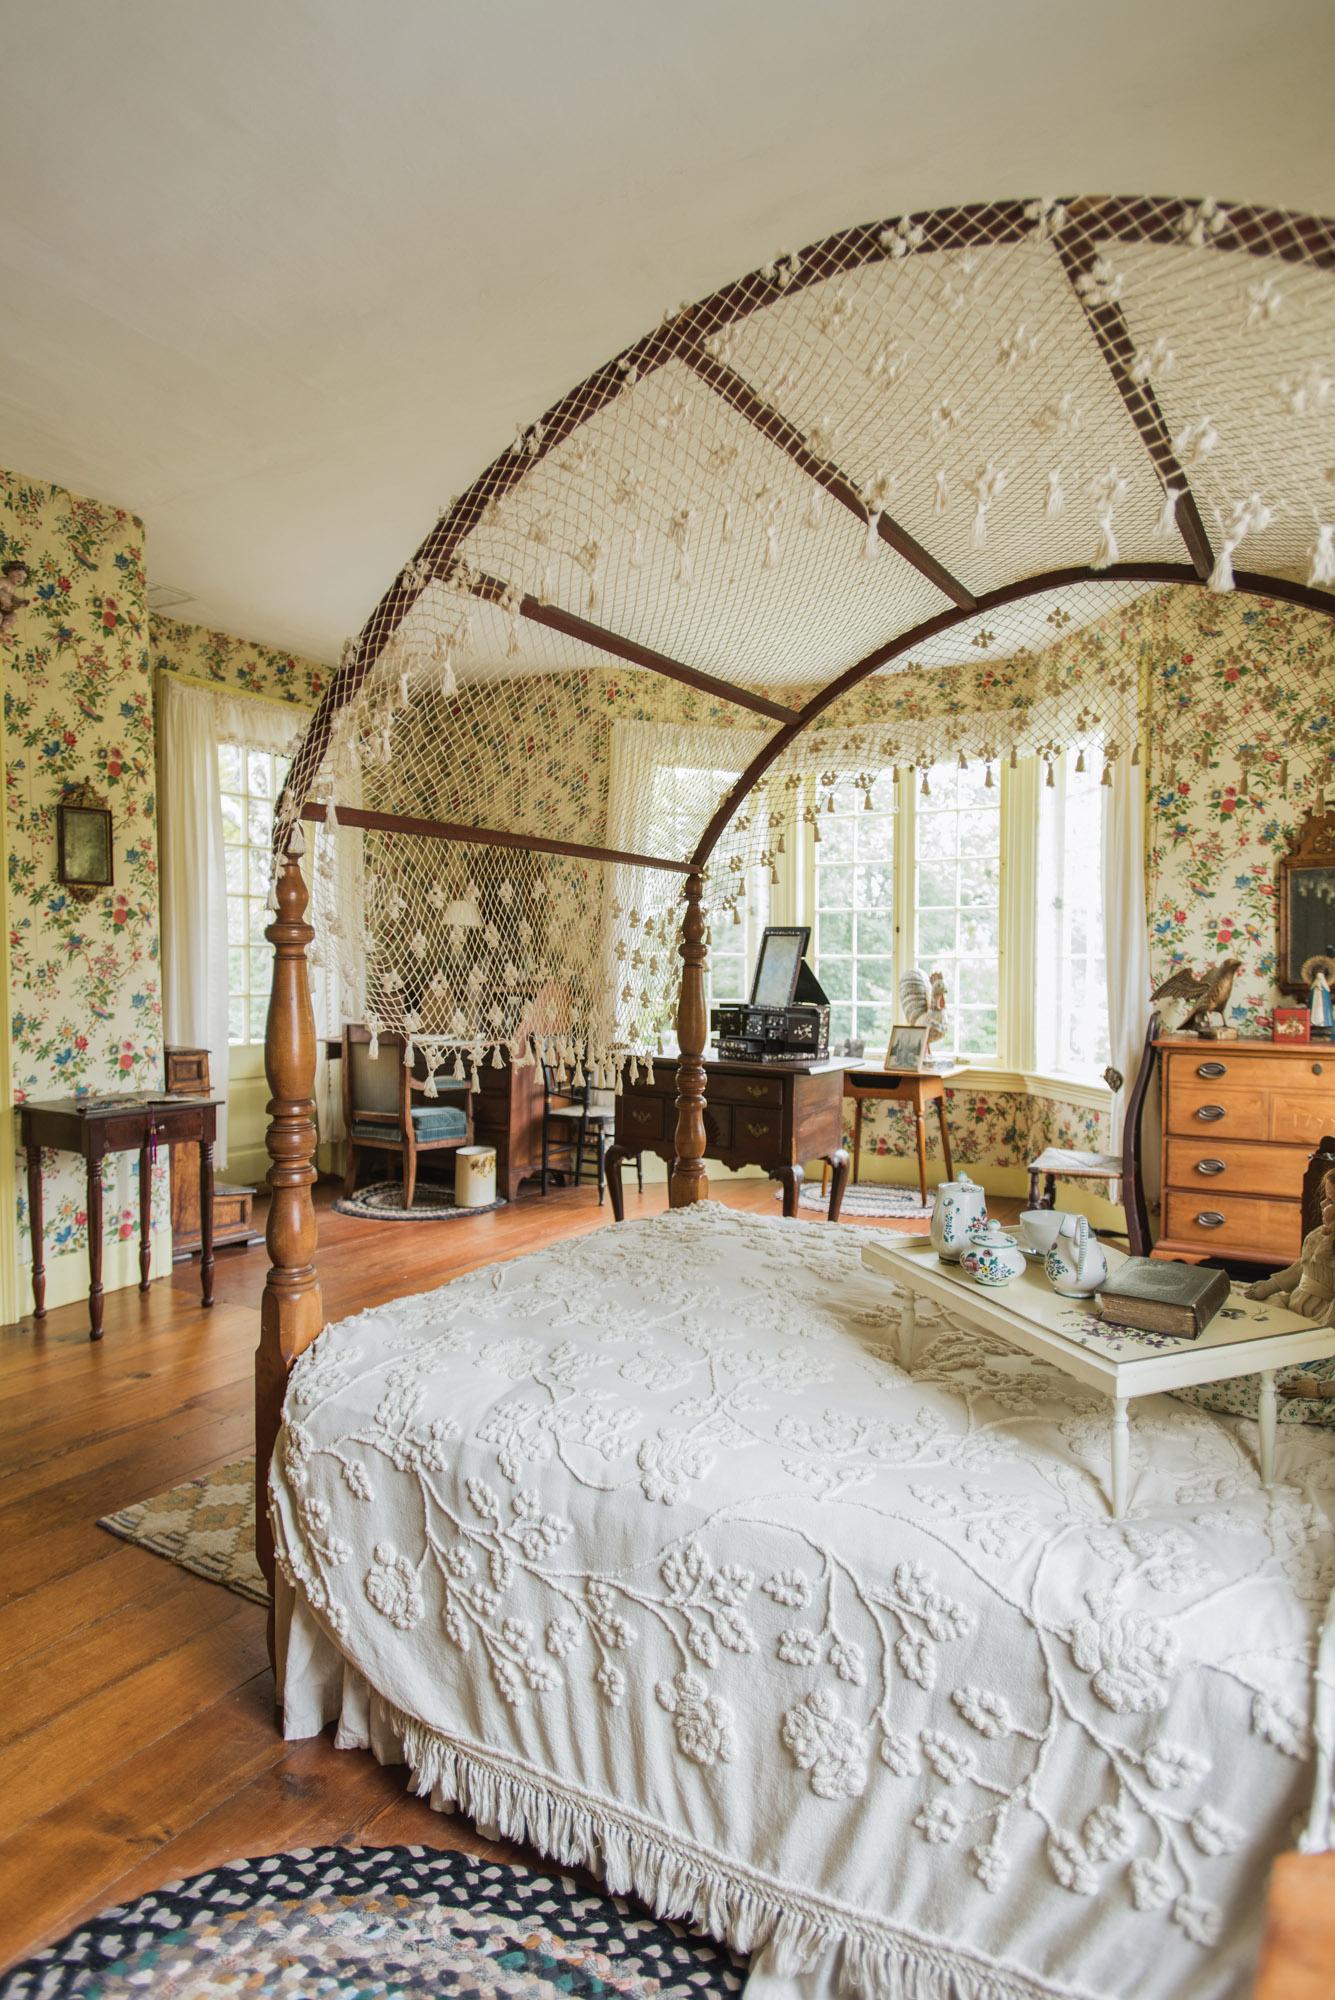 Bellamy-Ferriday bedroom, canopy bed